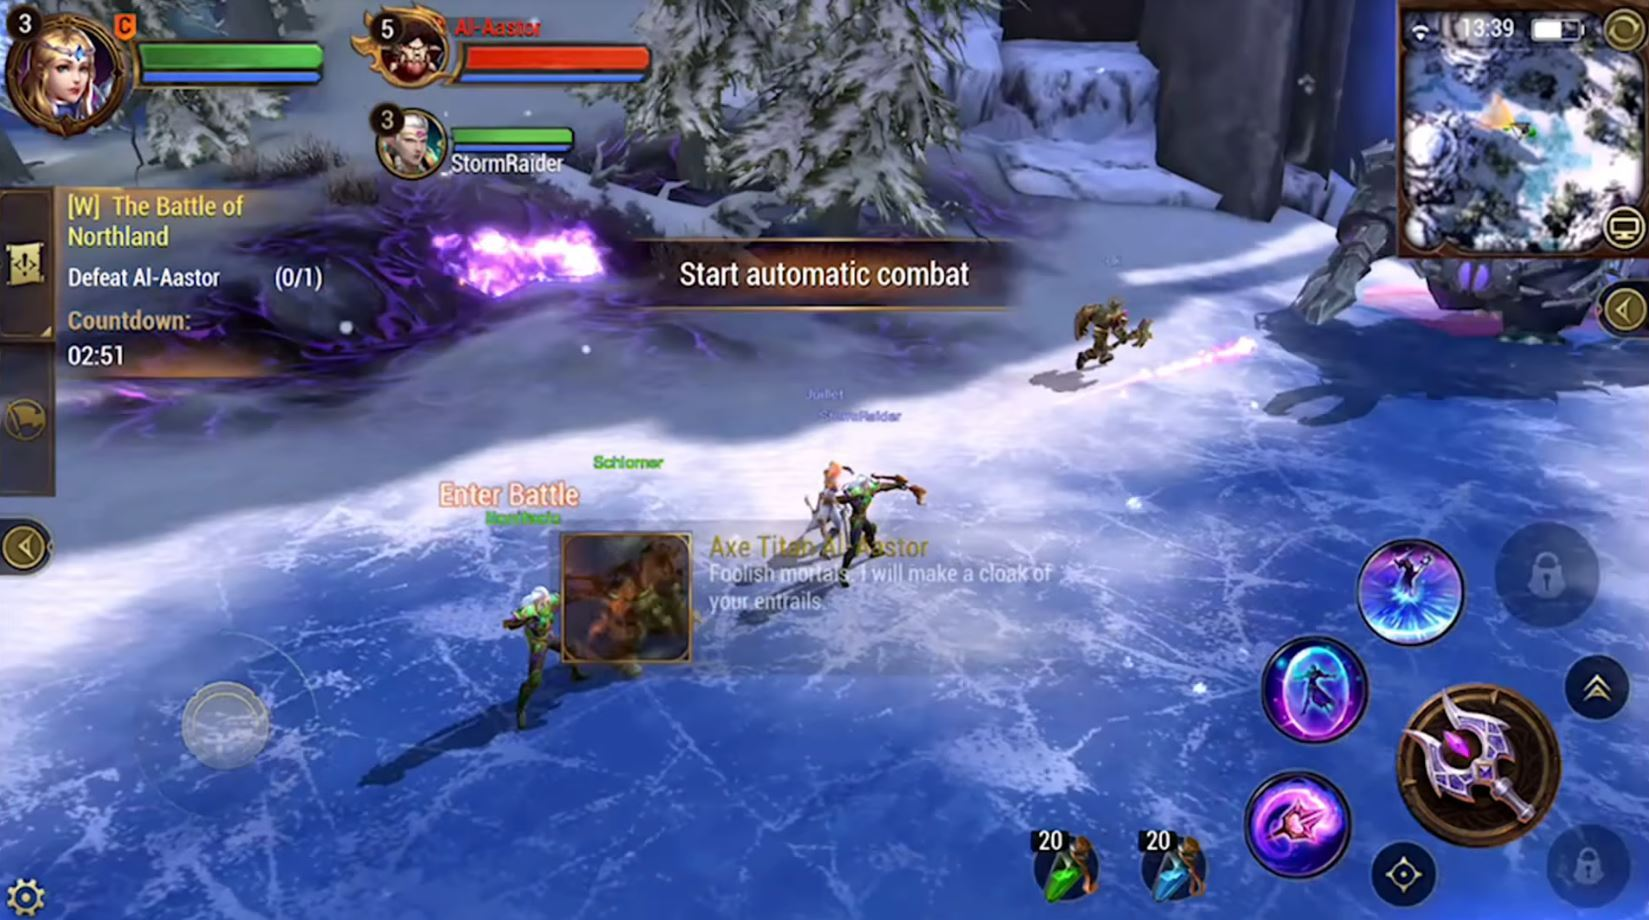 Diablo Immortal - Rise as a Champion of Sanctuary